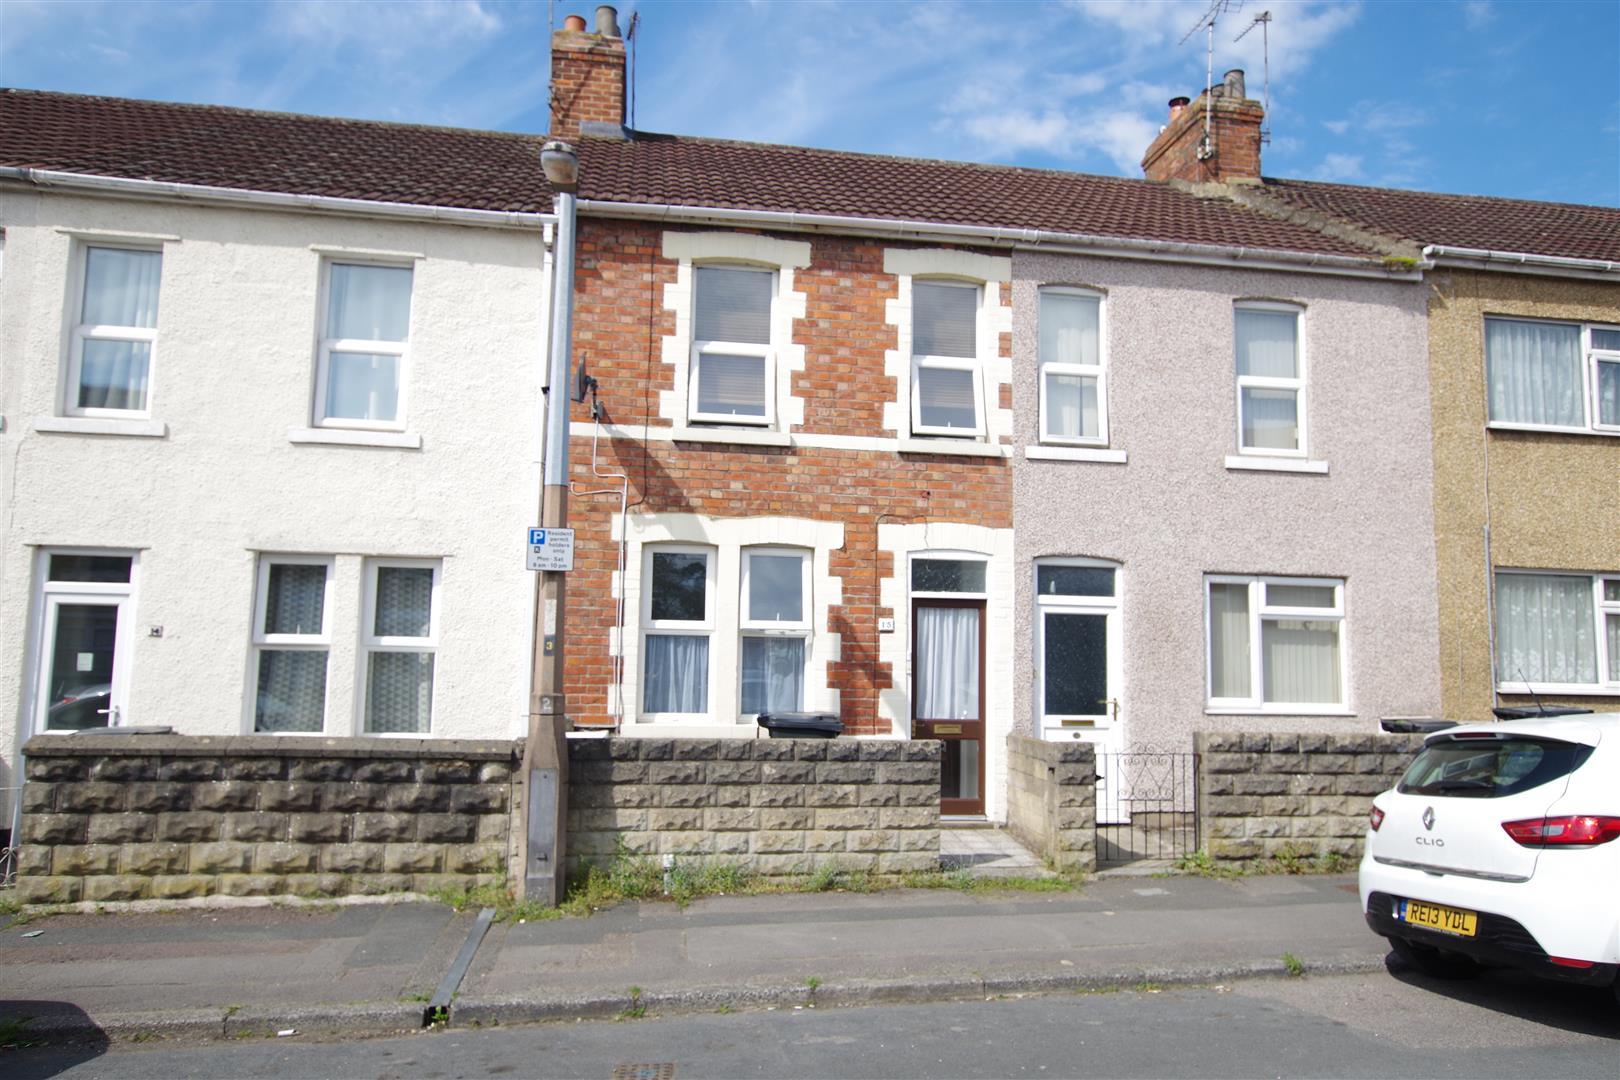 George Street, Rodbourne, Swindon